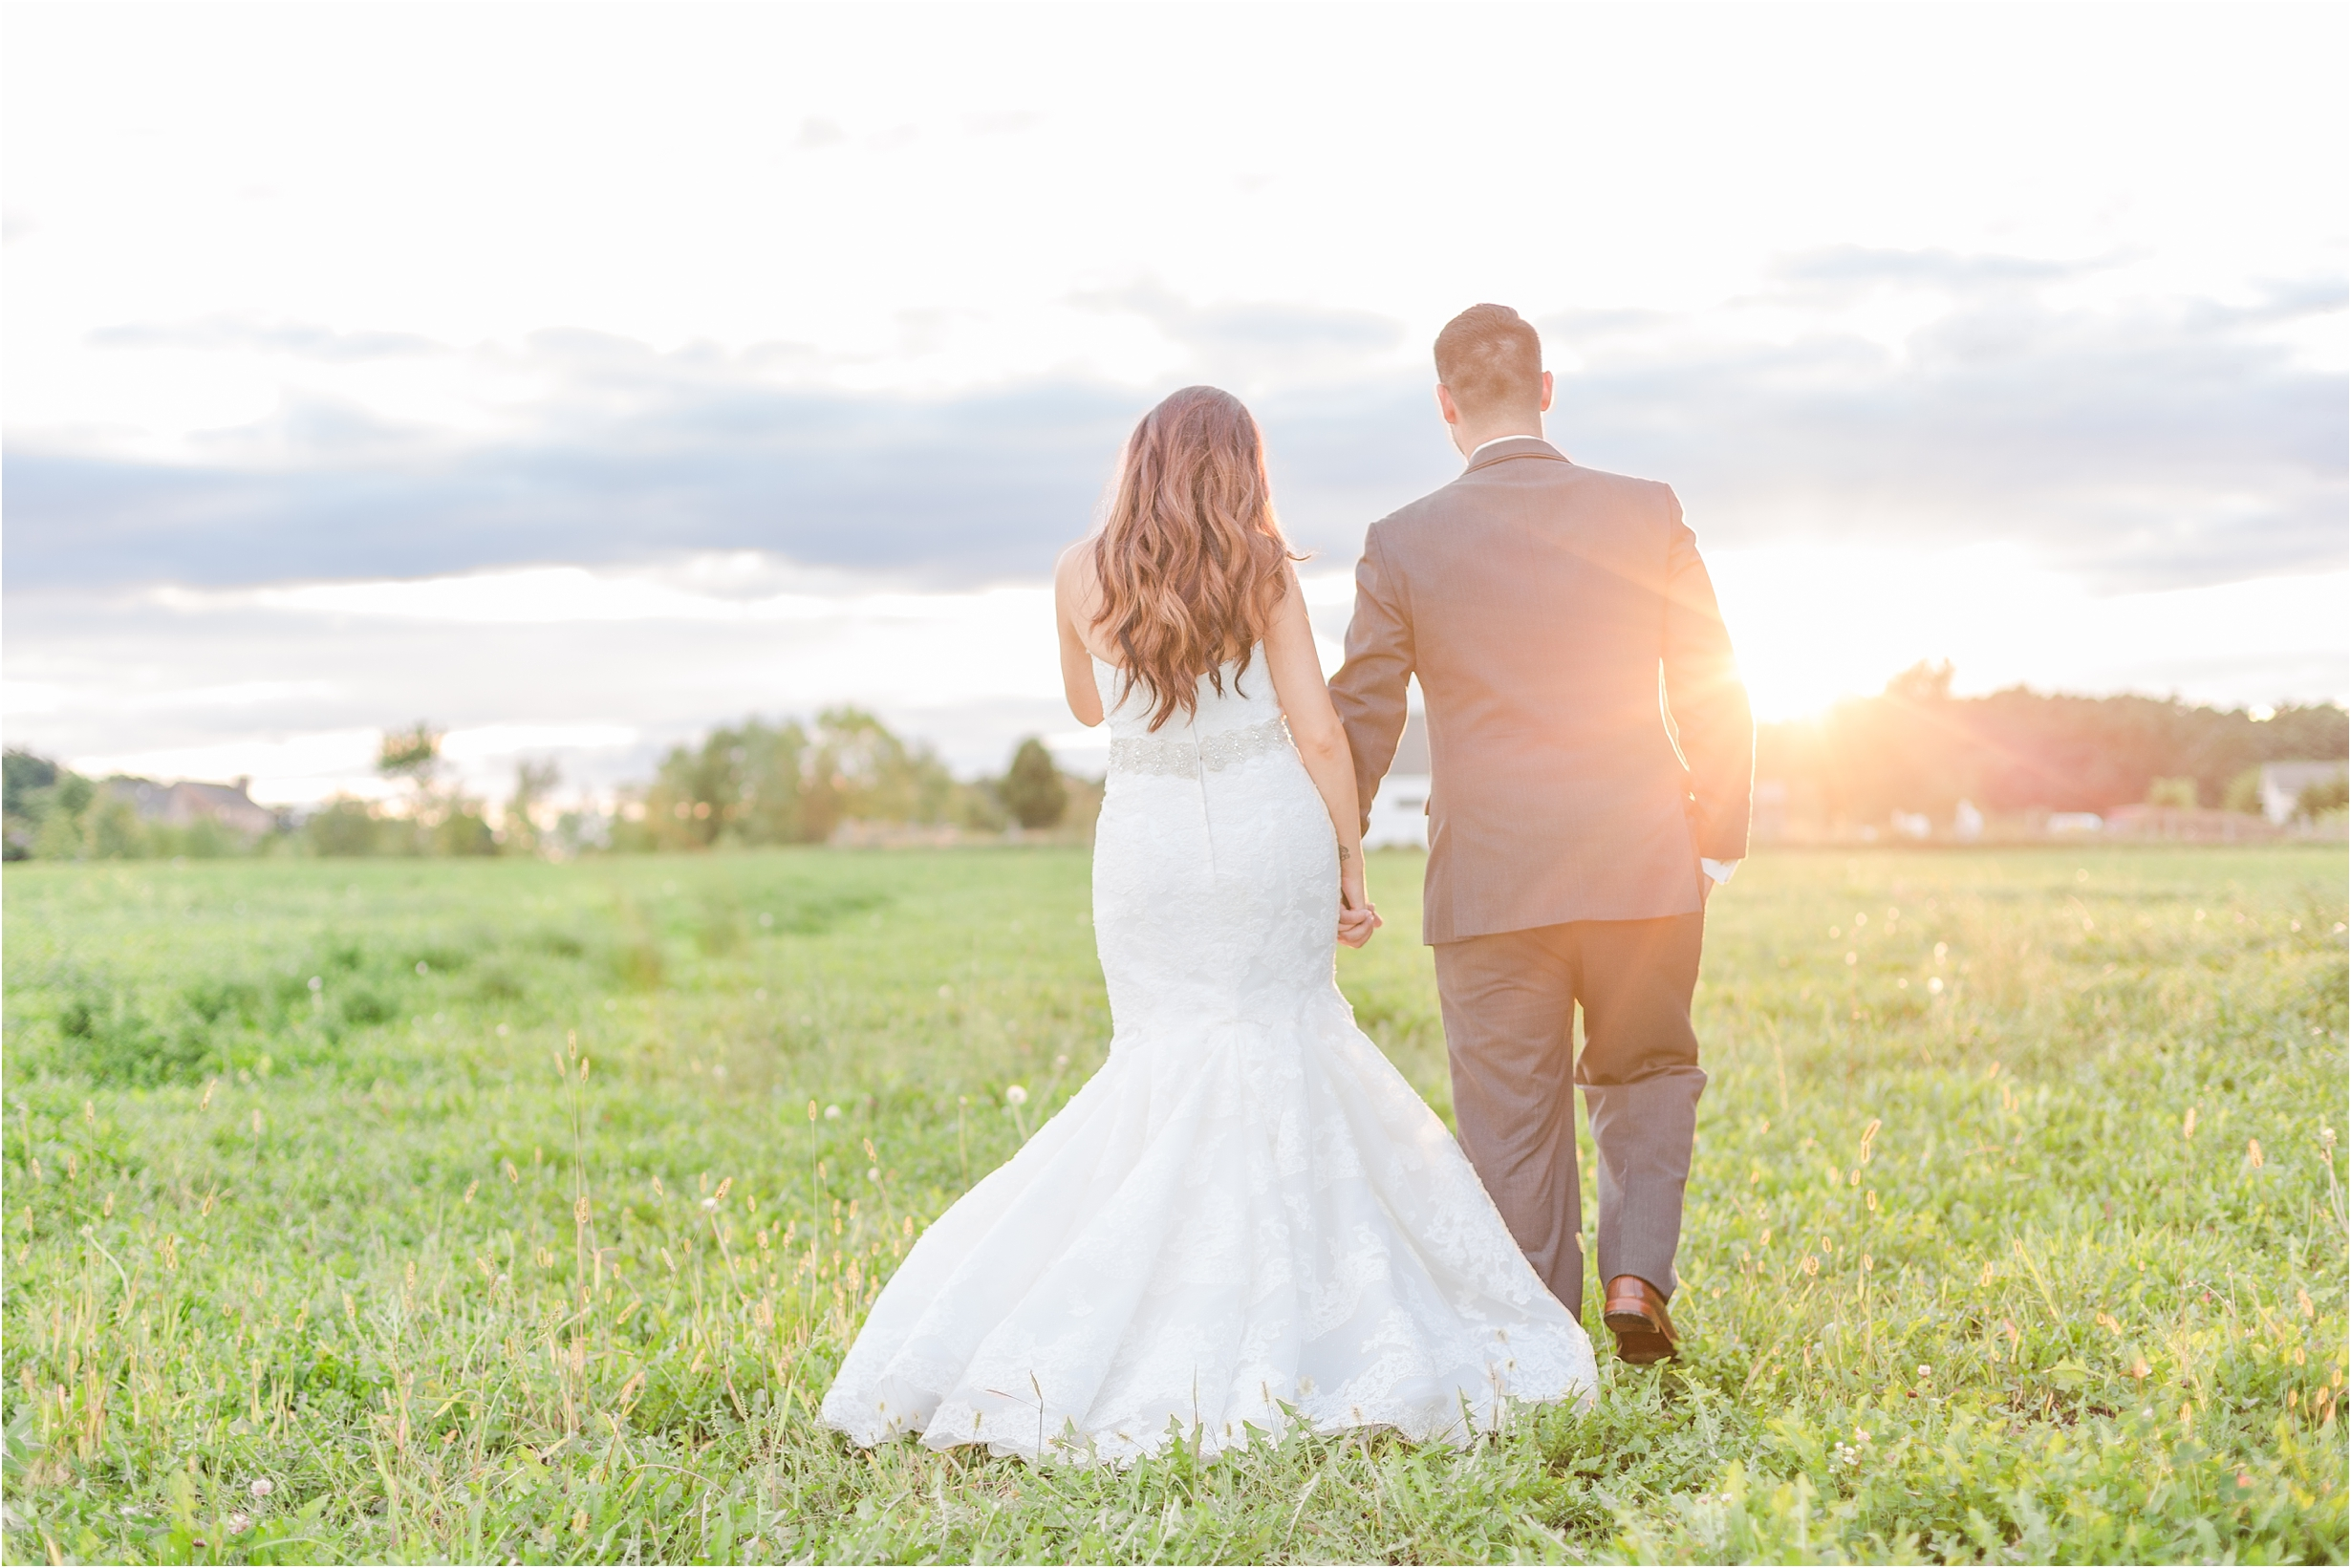 romantic-timeless-candid-wedding-photos-at-the-valley-frutig-farms-in-ann-arbor-mi-by-courtney-carolyn-photography_0008.jpg